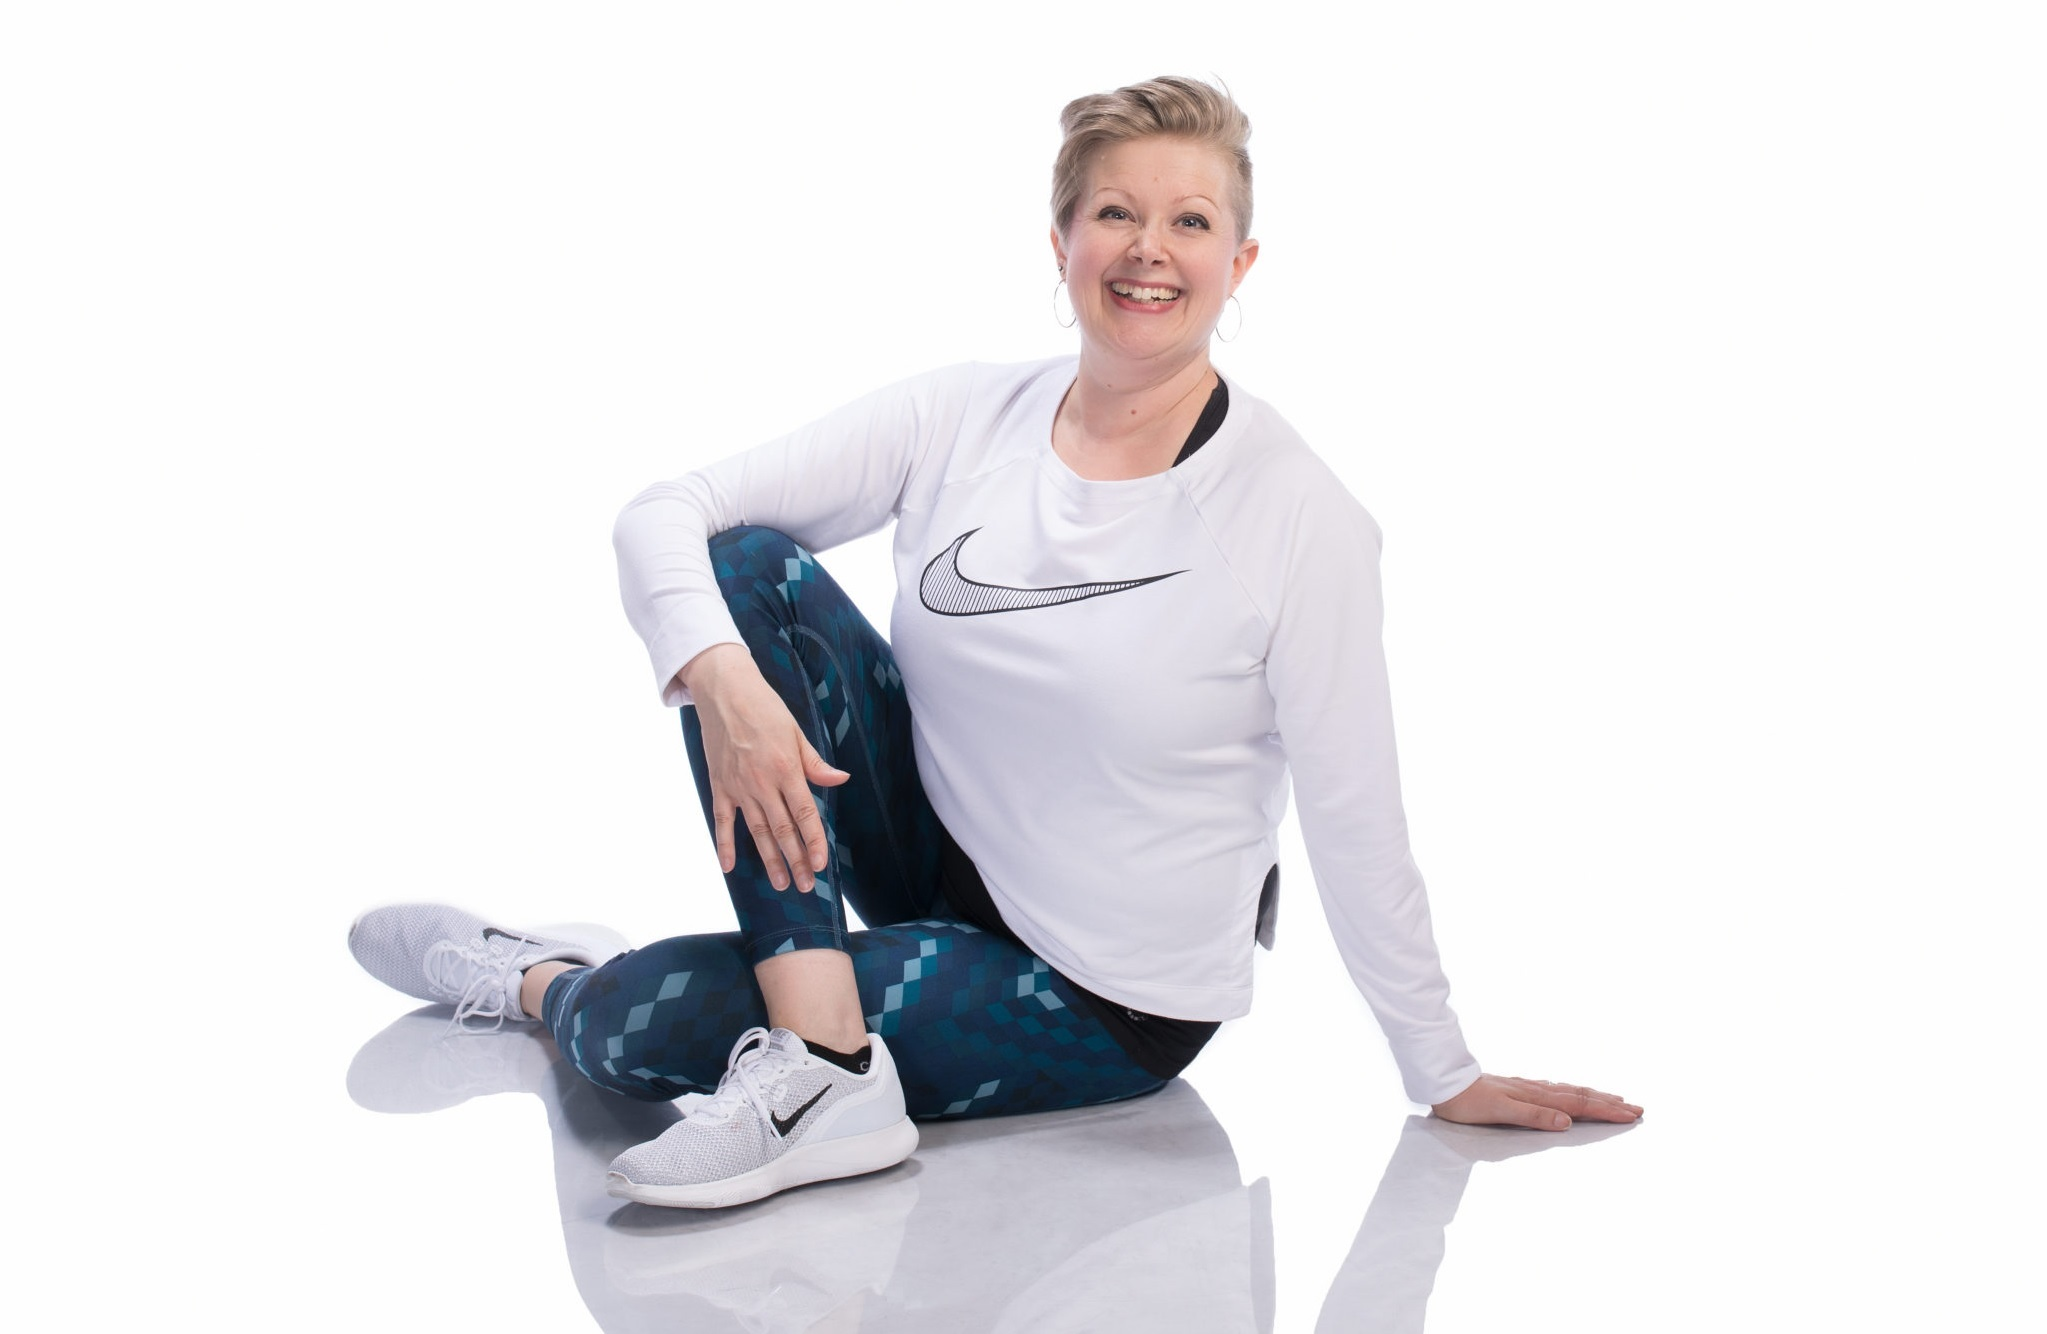 liikuntakumppani_paula_personal_trainer_uusimaa_banneri